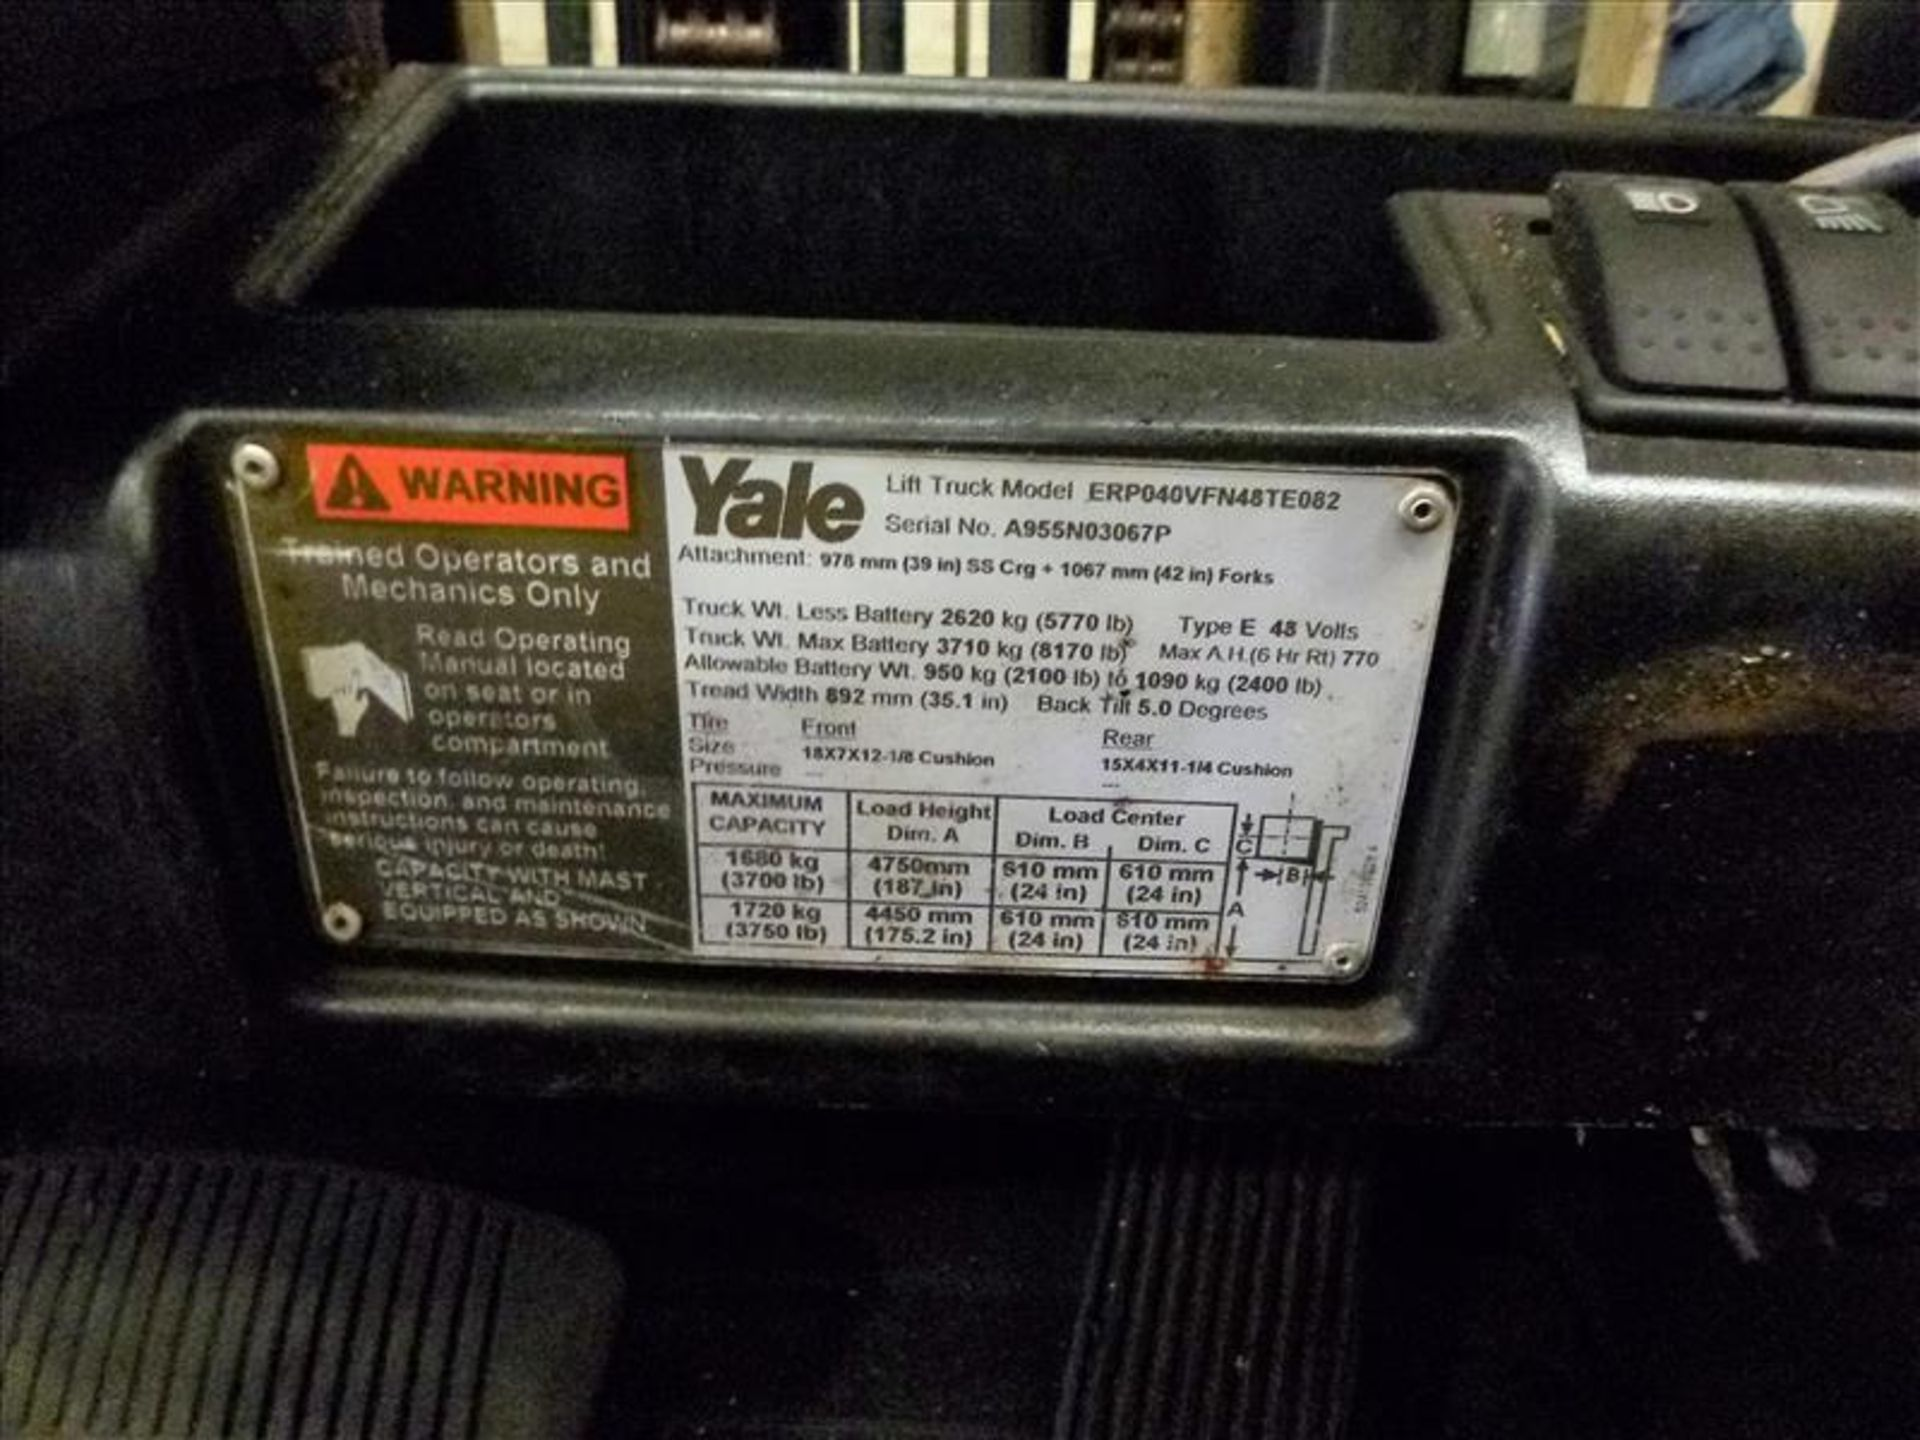 Lot 2015 - Yale fork lift truck, mod. ERP040VFN48TE082, ser. no. A955N03067P, 48V electric, 3700 lbs cap.,